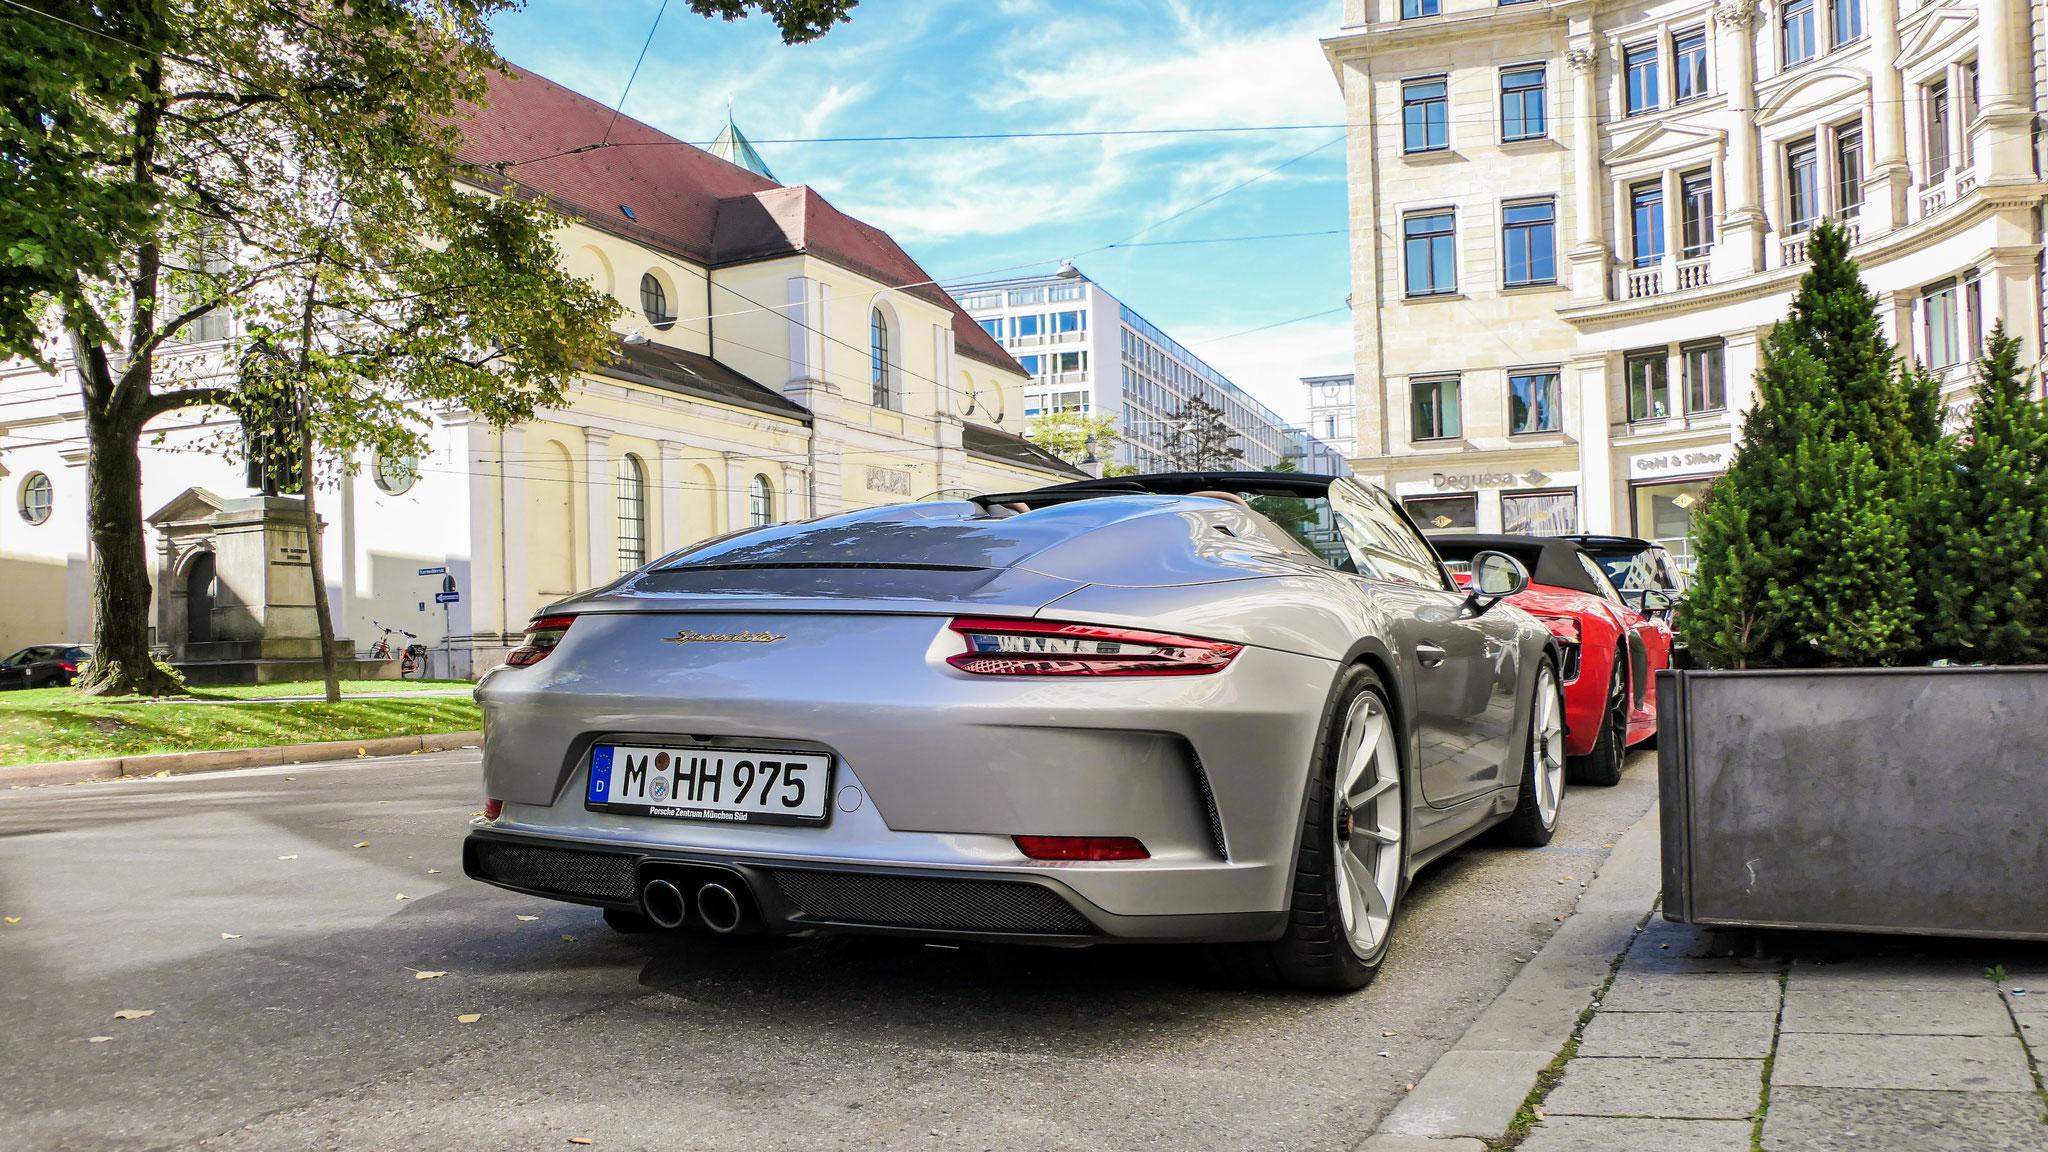 Porsche 991 Speedster - M-HH-975